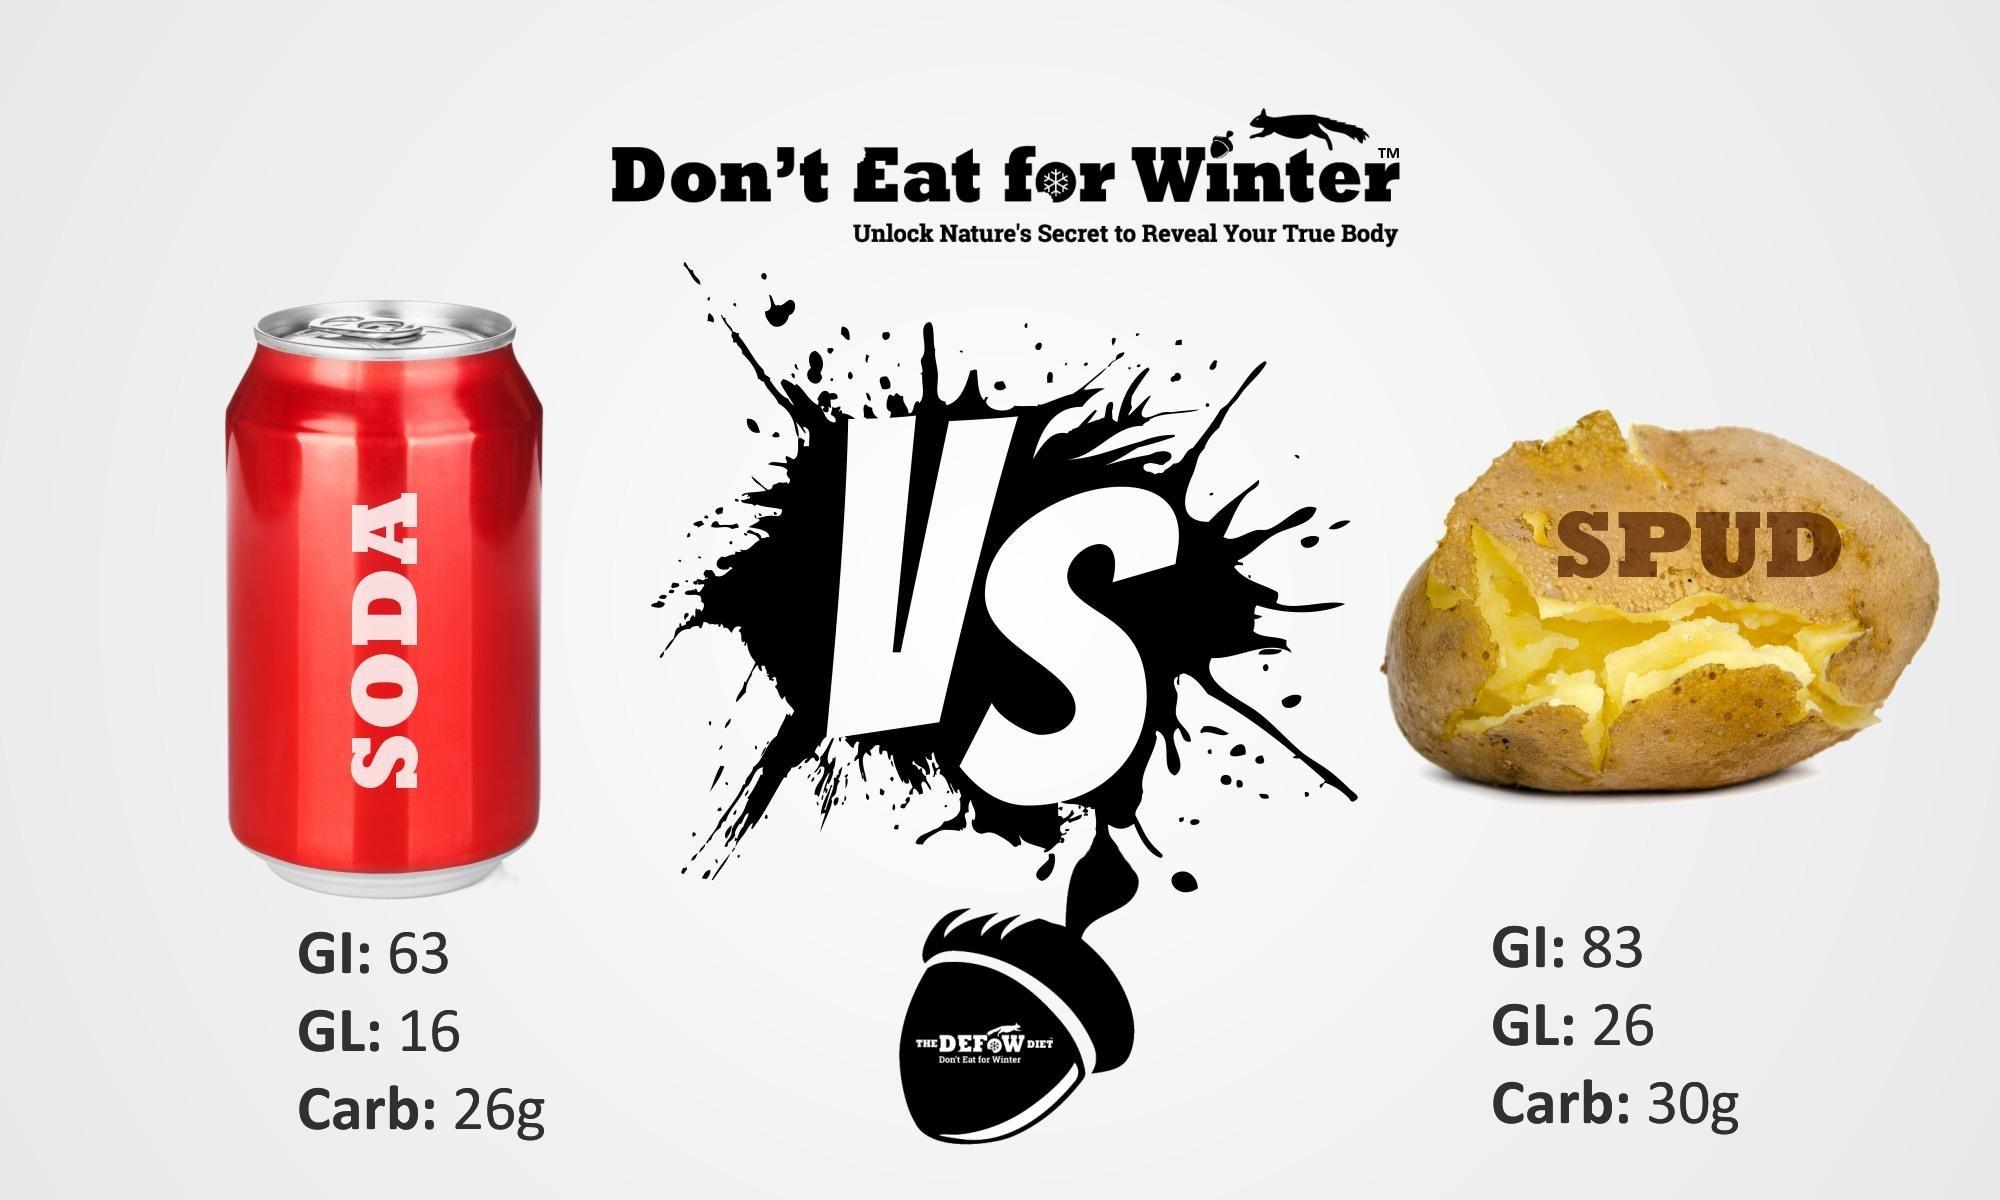 Do Potatoes Raise Blood Sugar Levels?